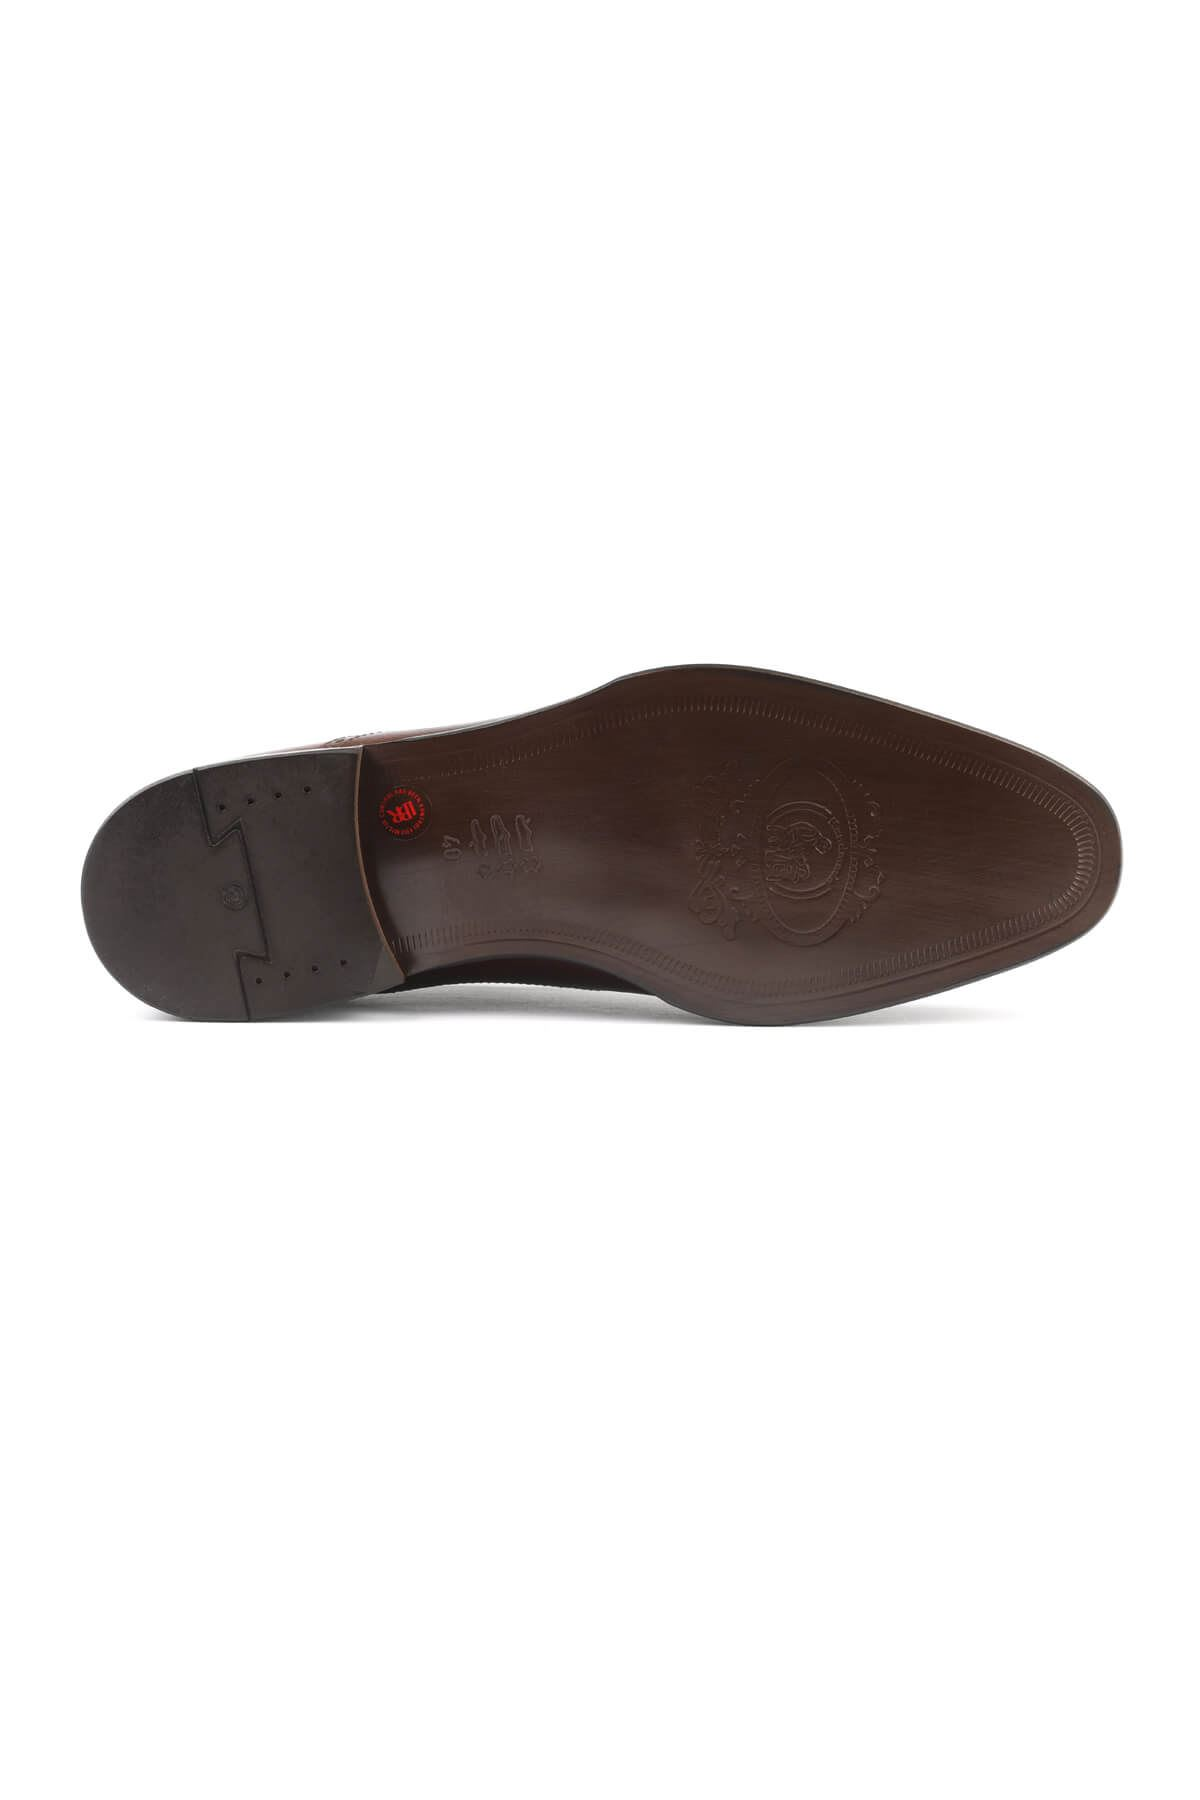 Libero 2883 Brown Classic Shoes